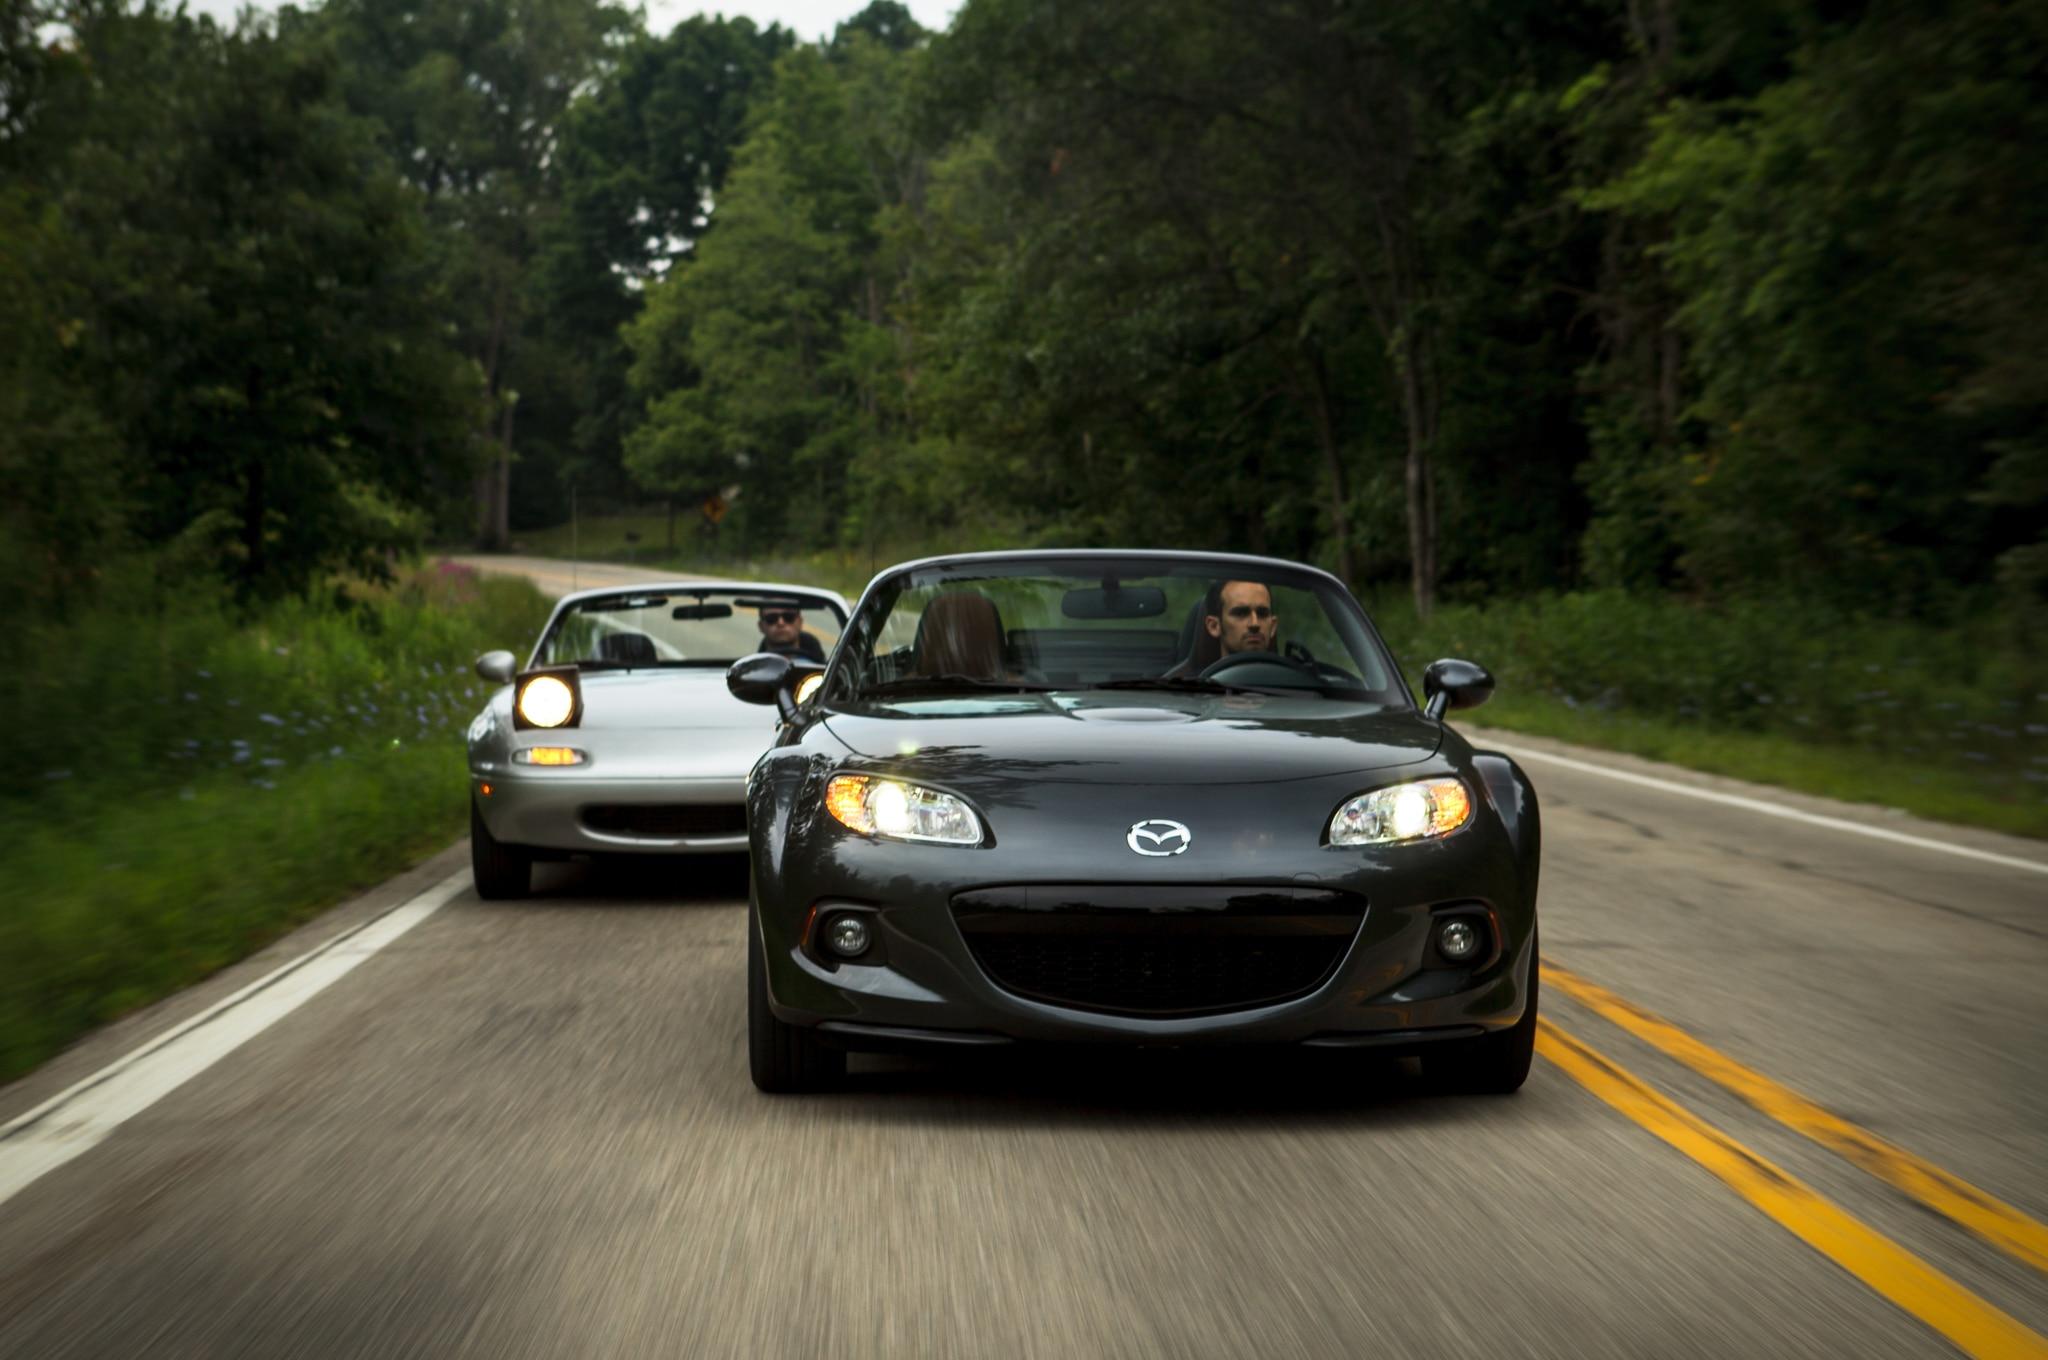 1991 Mazda MX 5 Miata 2014 Mazda MX 5 Miata PRHT GT Front End